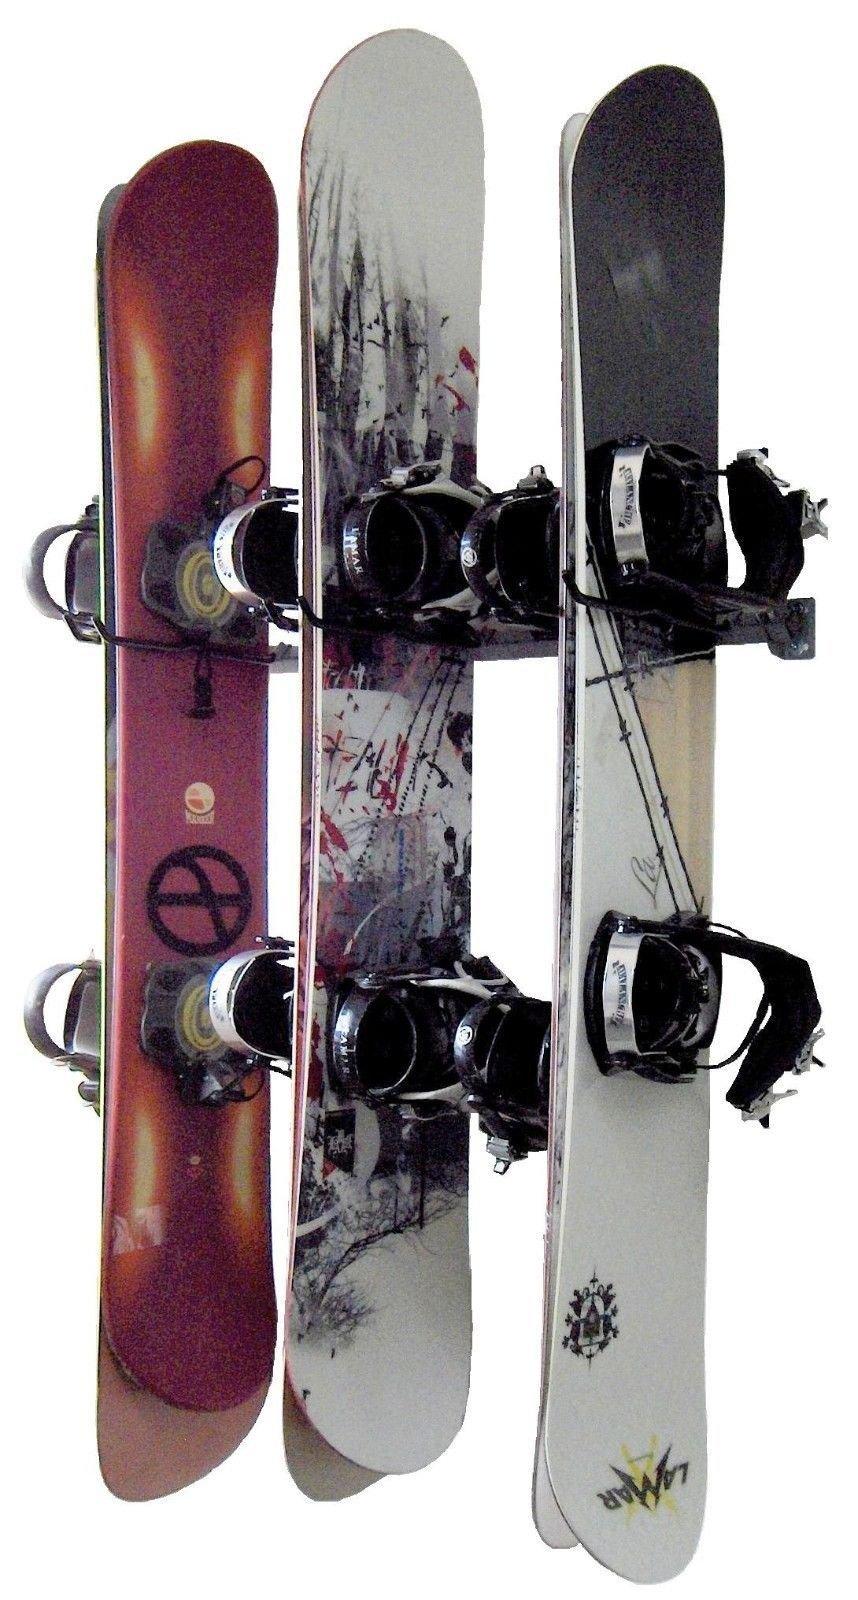 Monkey Bars Snowboard Wall Rack